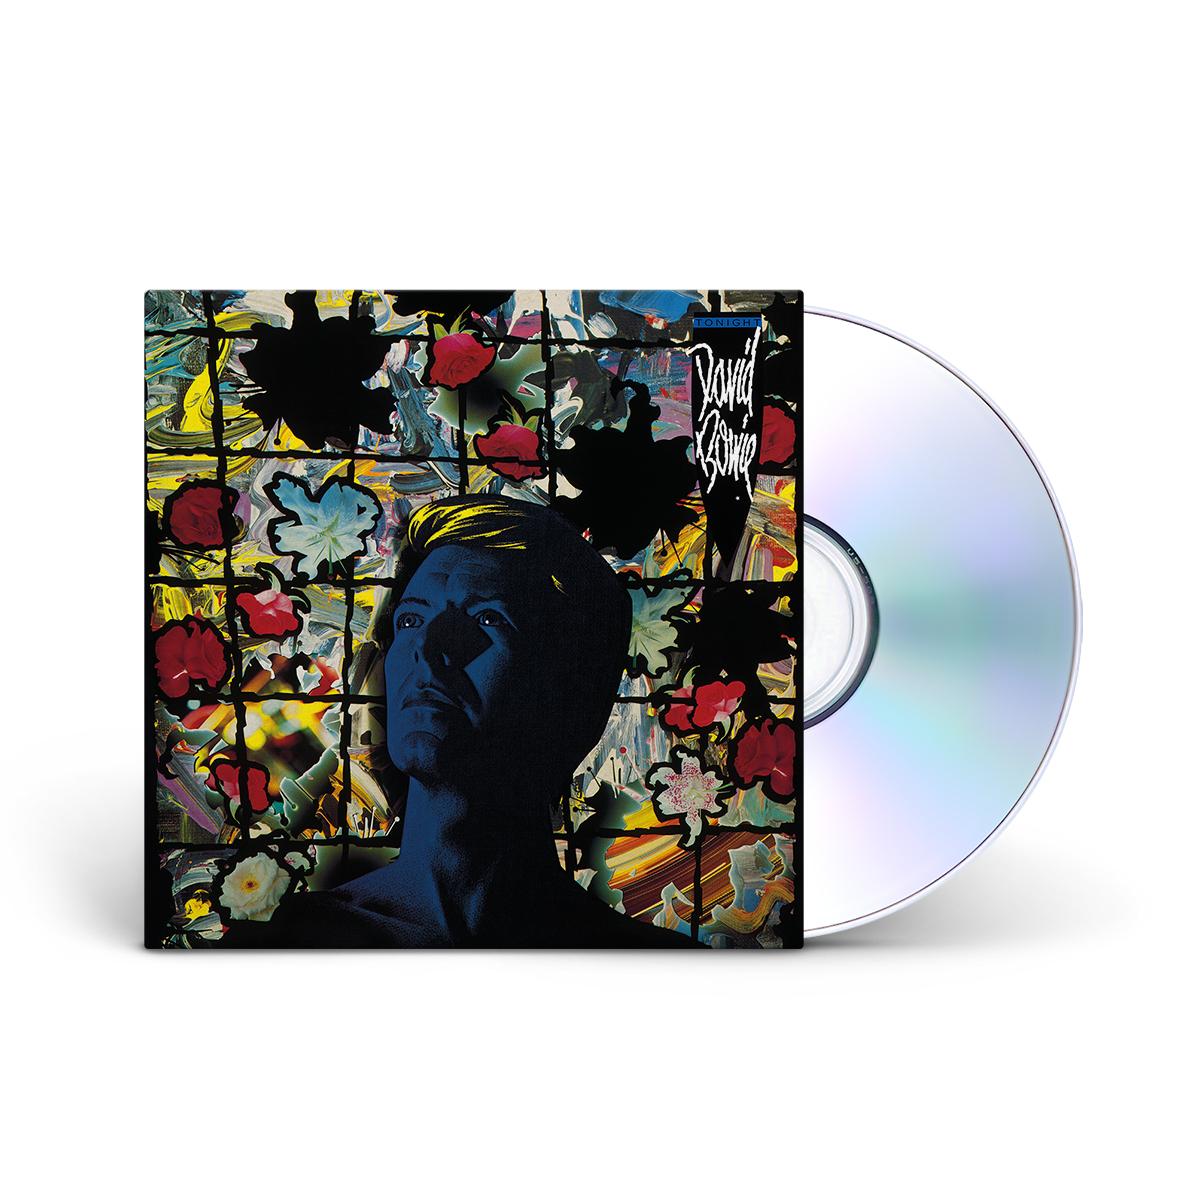 David Bowie - Tonight (2018 Remastered Version) CD